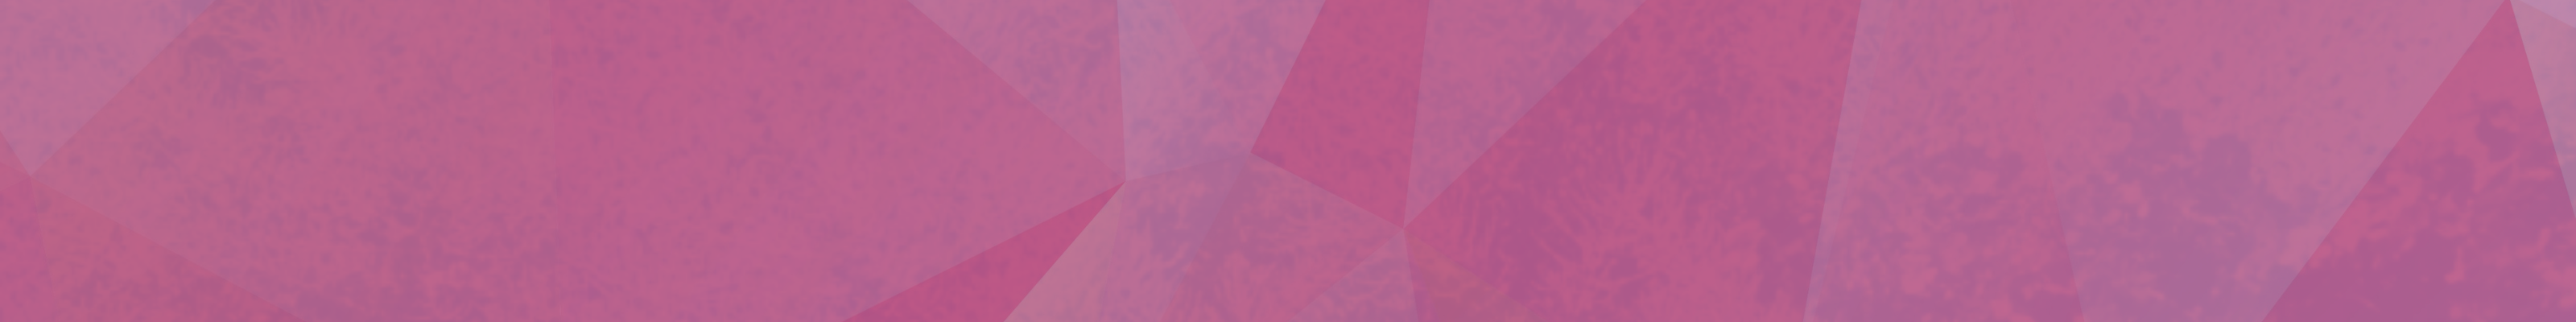 upc_genere_recursos.png